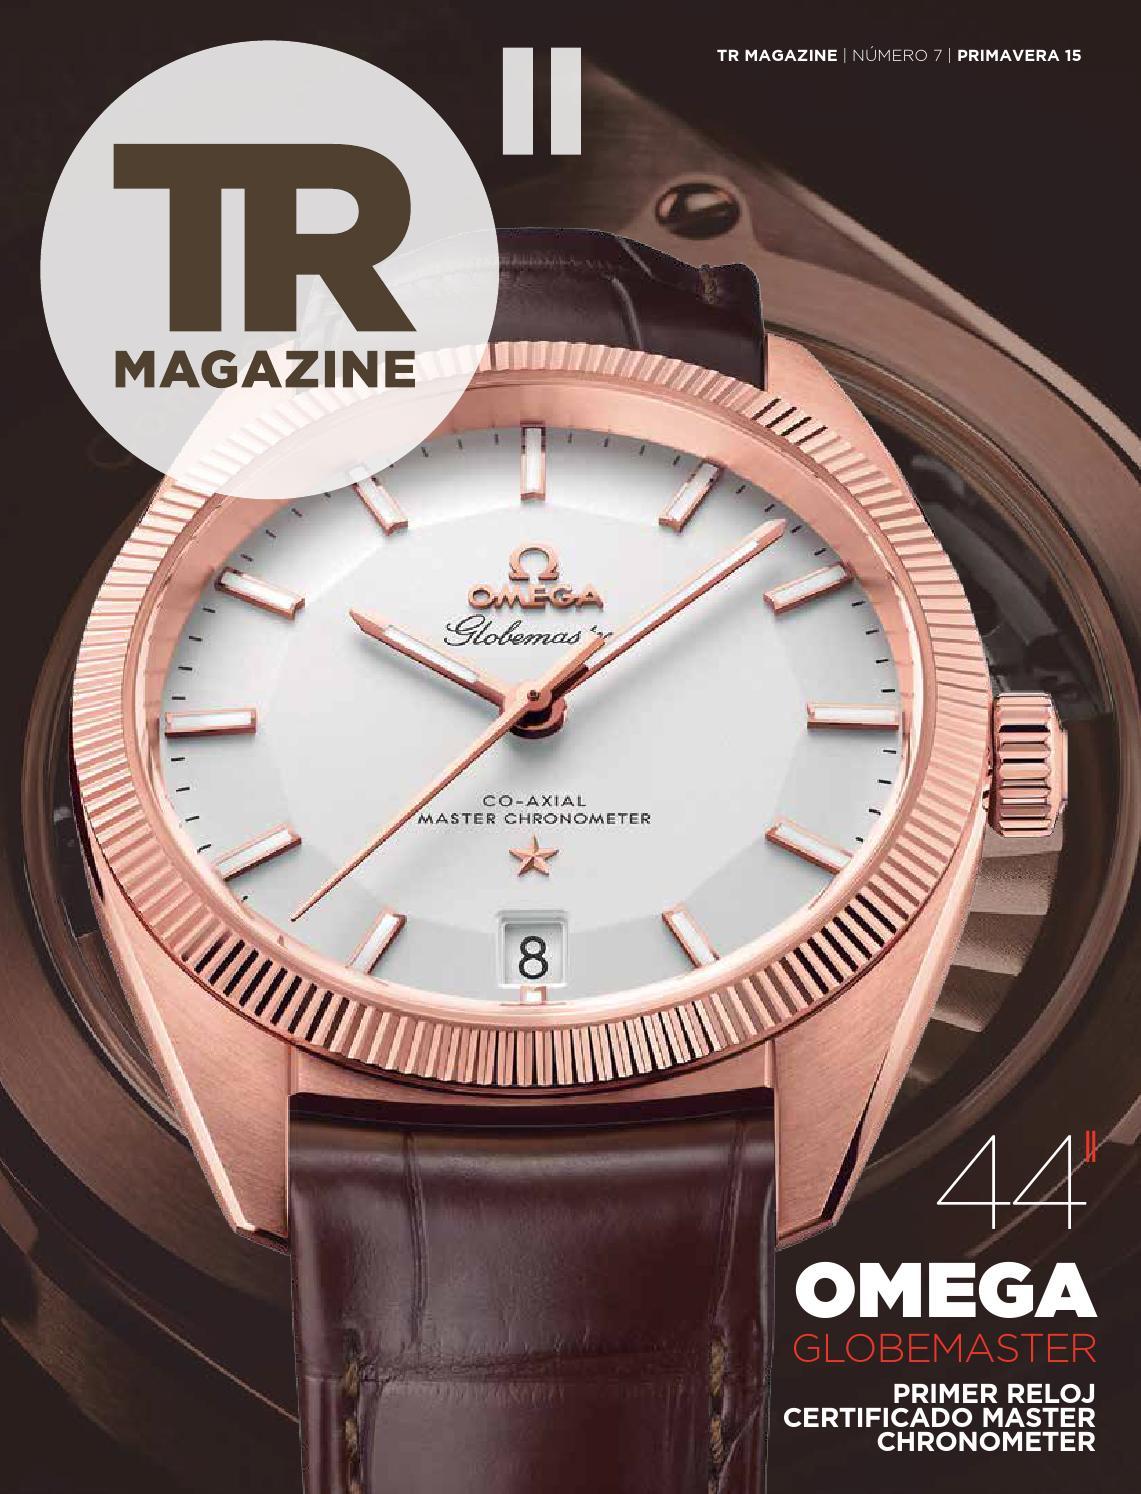 9545cada47 Tr magazine numero 7 by Ed-Tourbillon.Spain - issuu